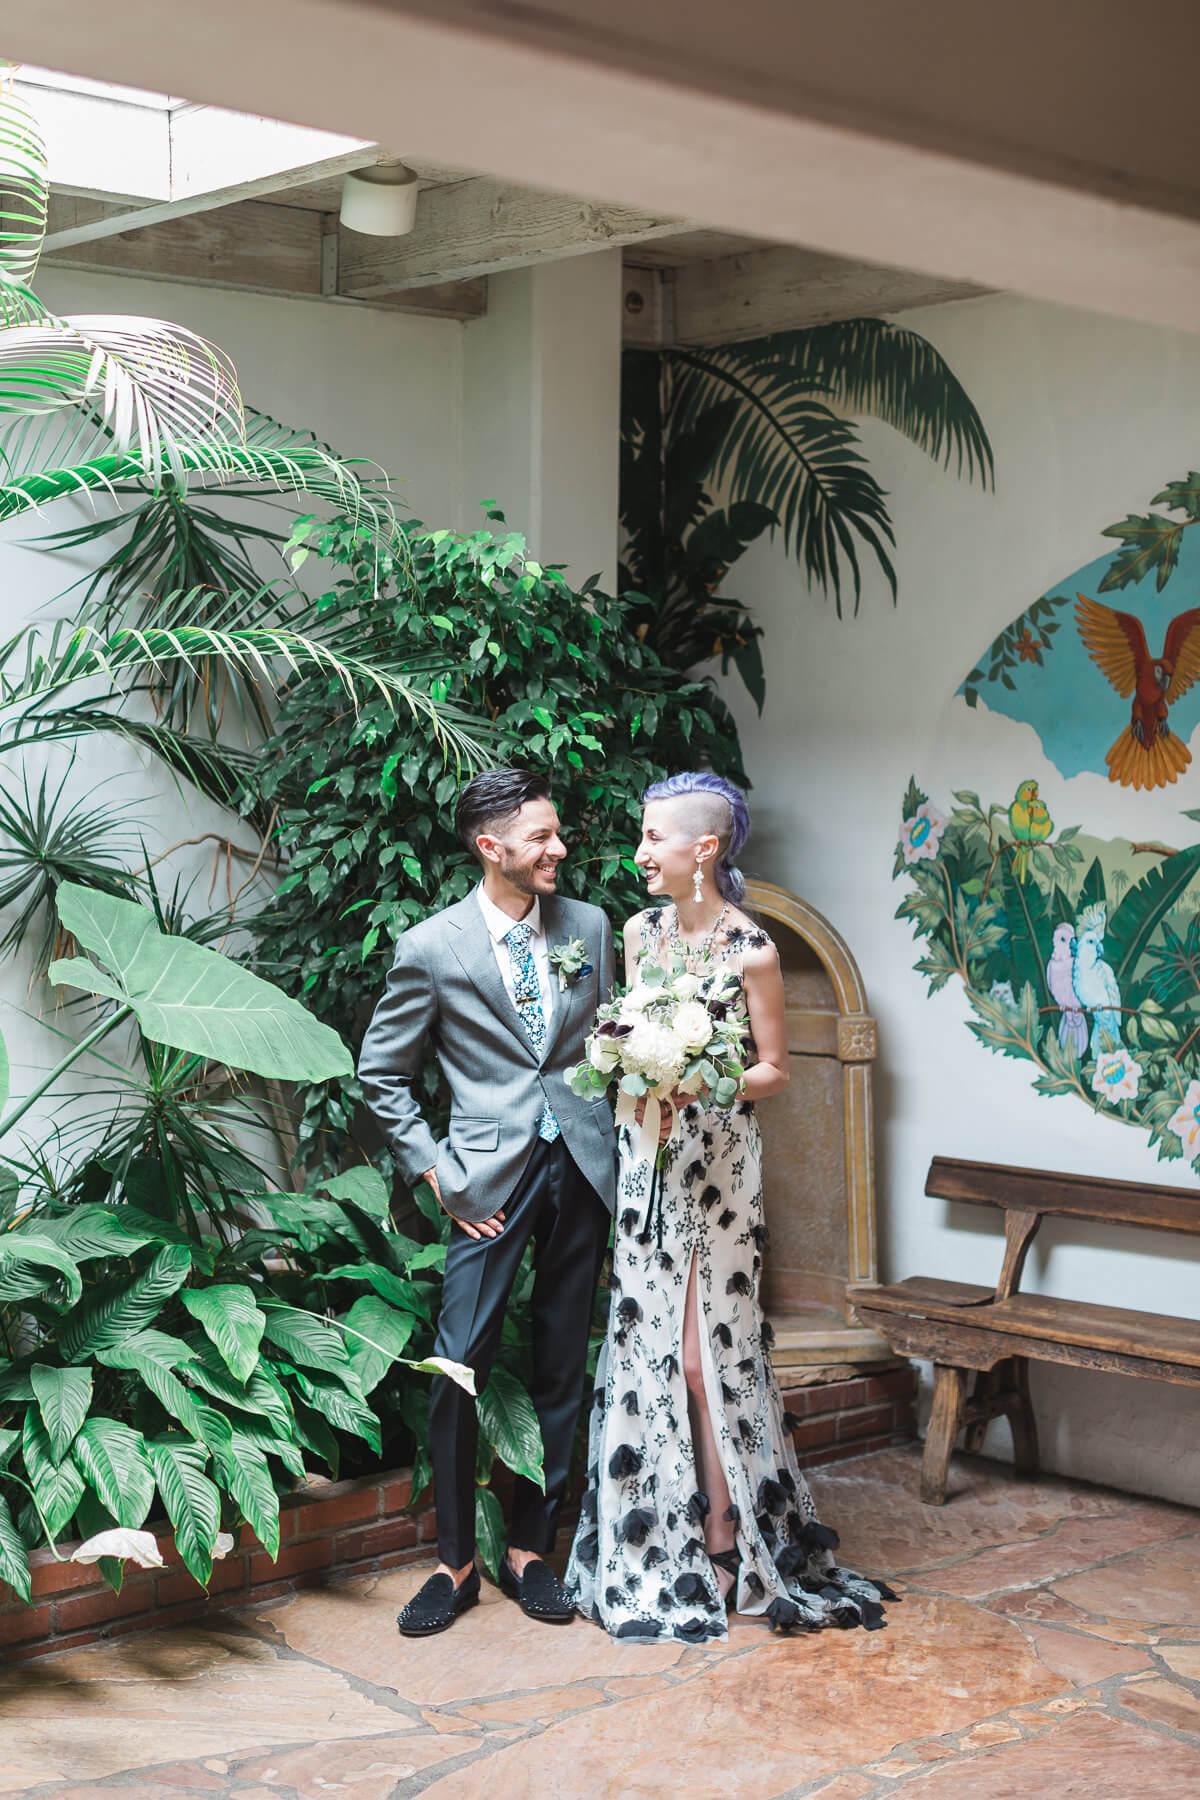 the_light_and_glass-wedding-photography-kim-jon-158.jpg